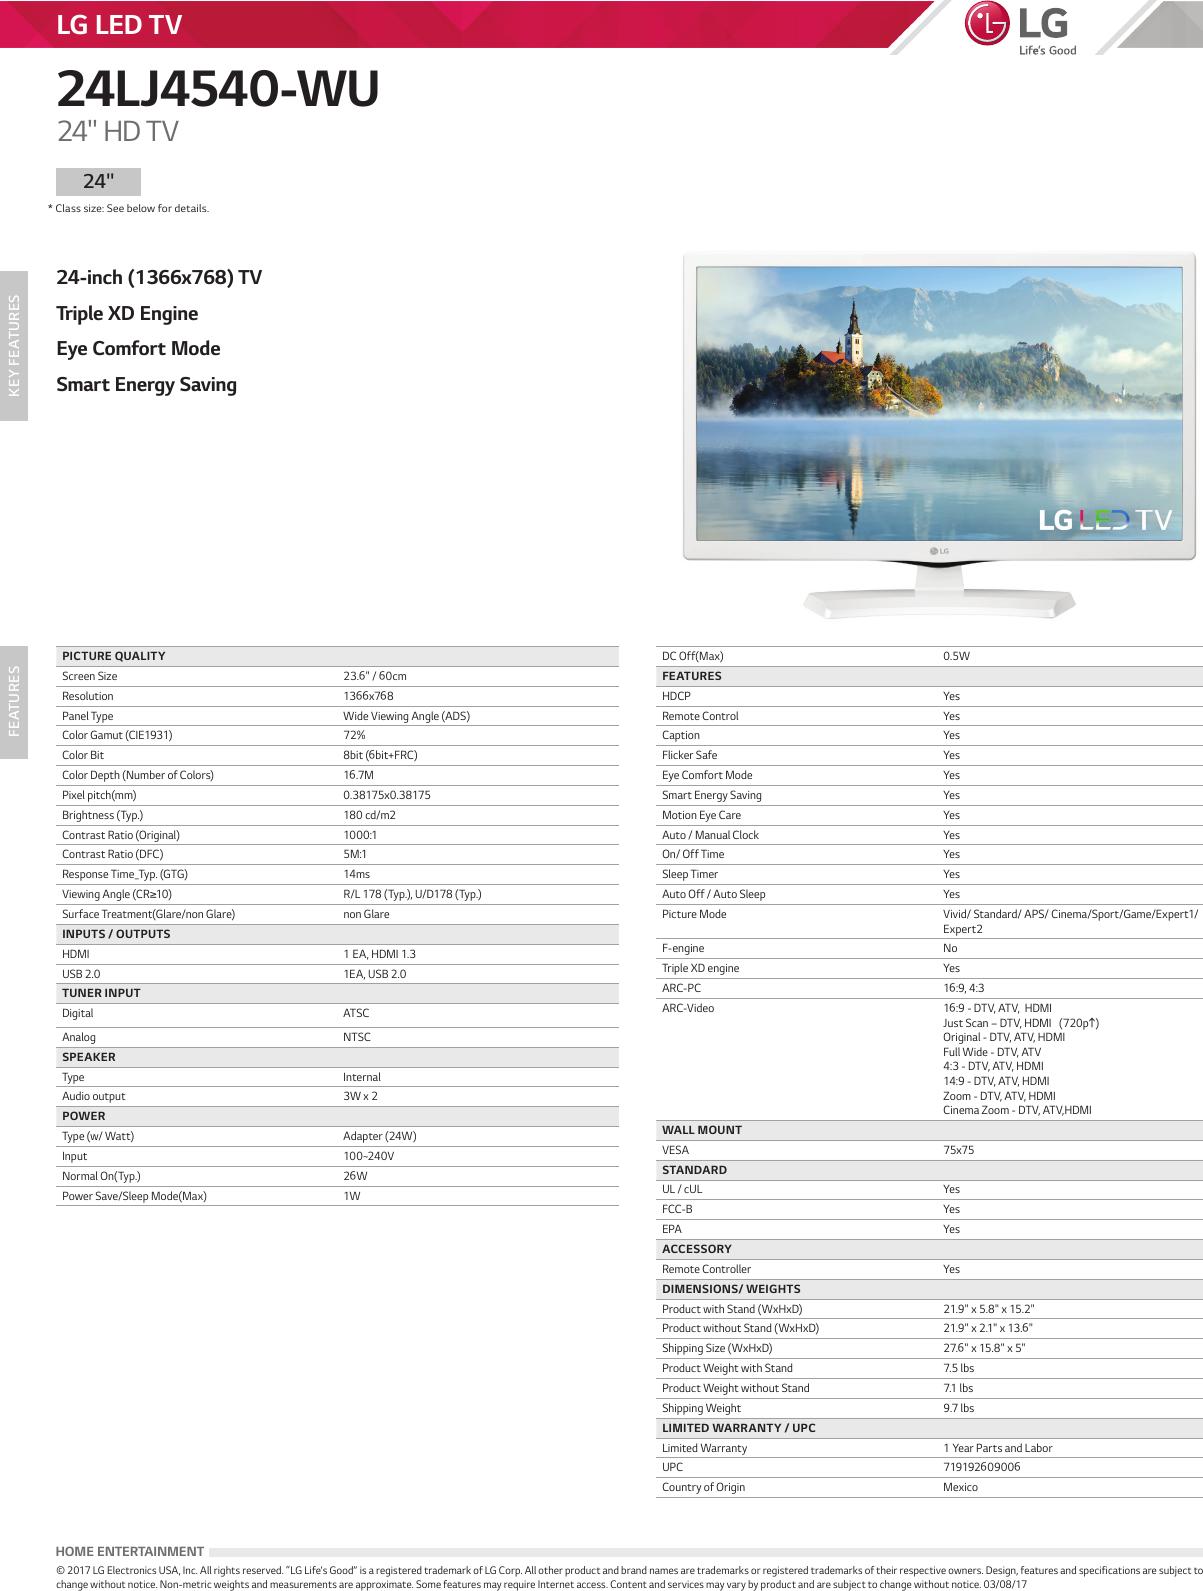 LG 24LJ4540 WU User Manual Specification Spec Sheet